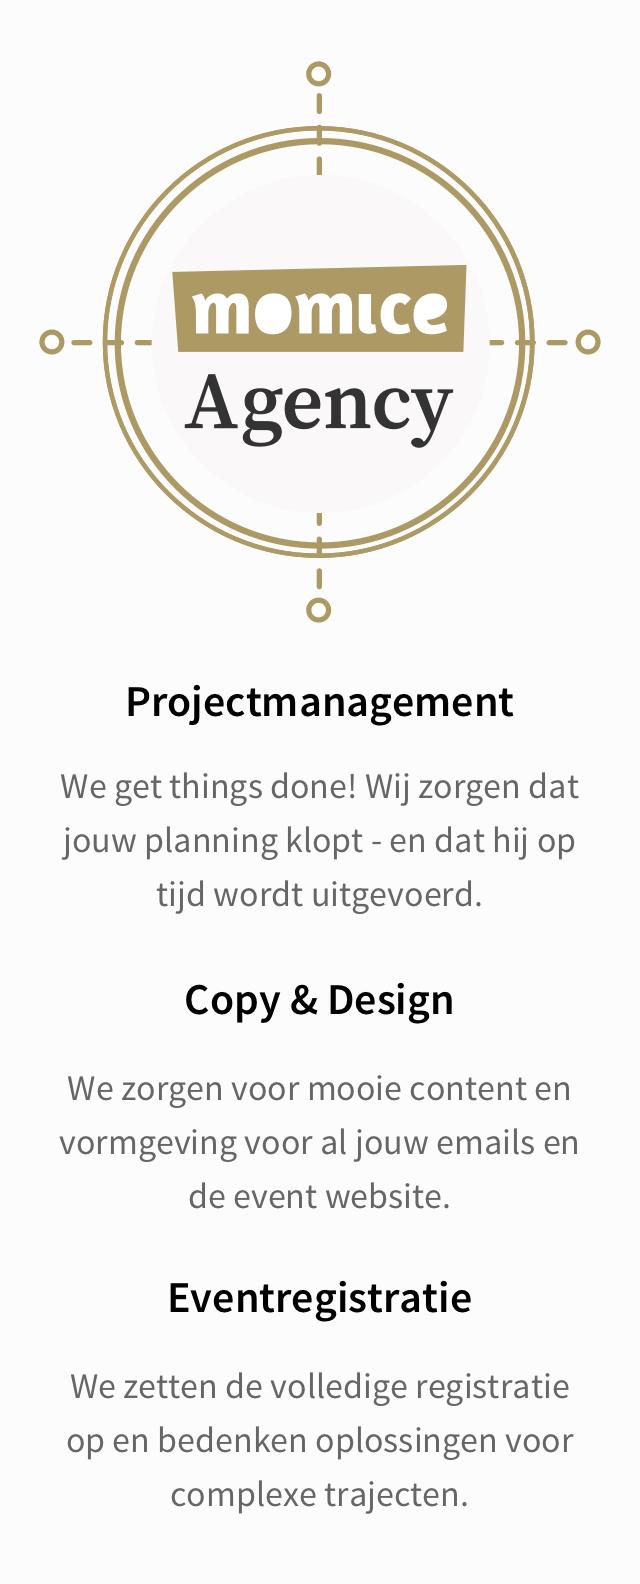 Momice Agency kan je helpen met projectmanagement